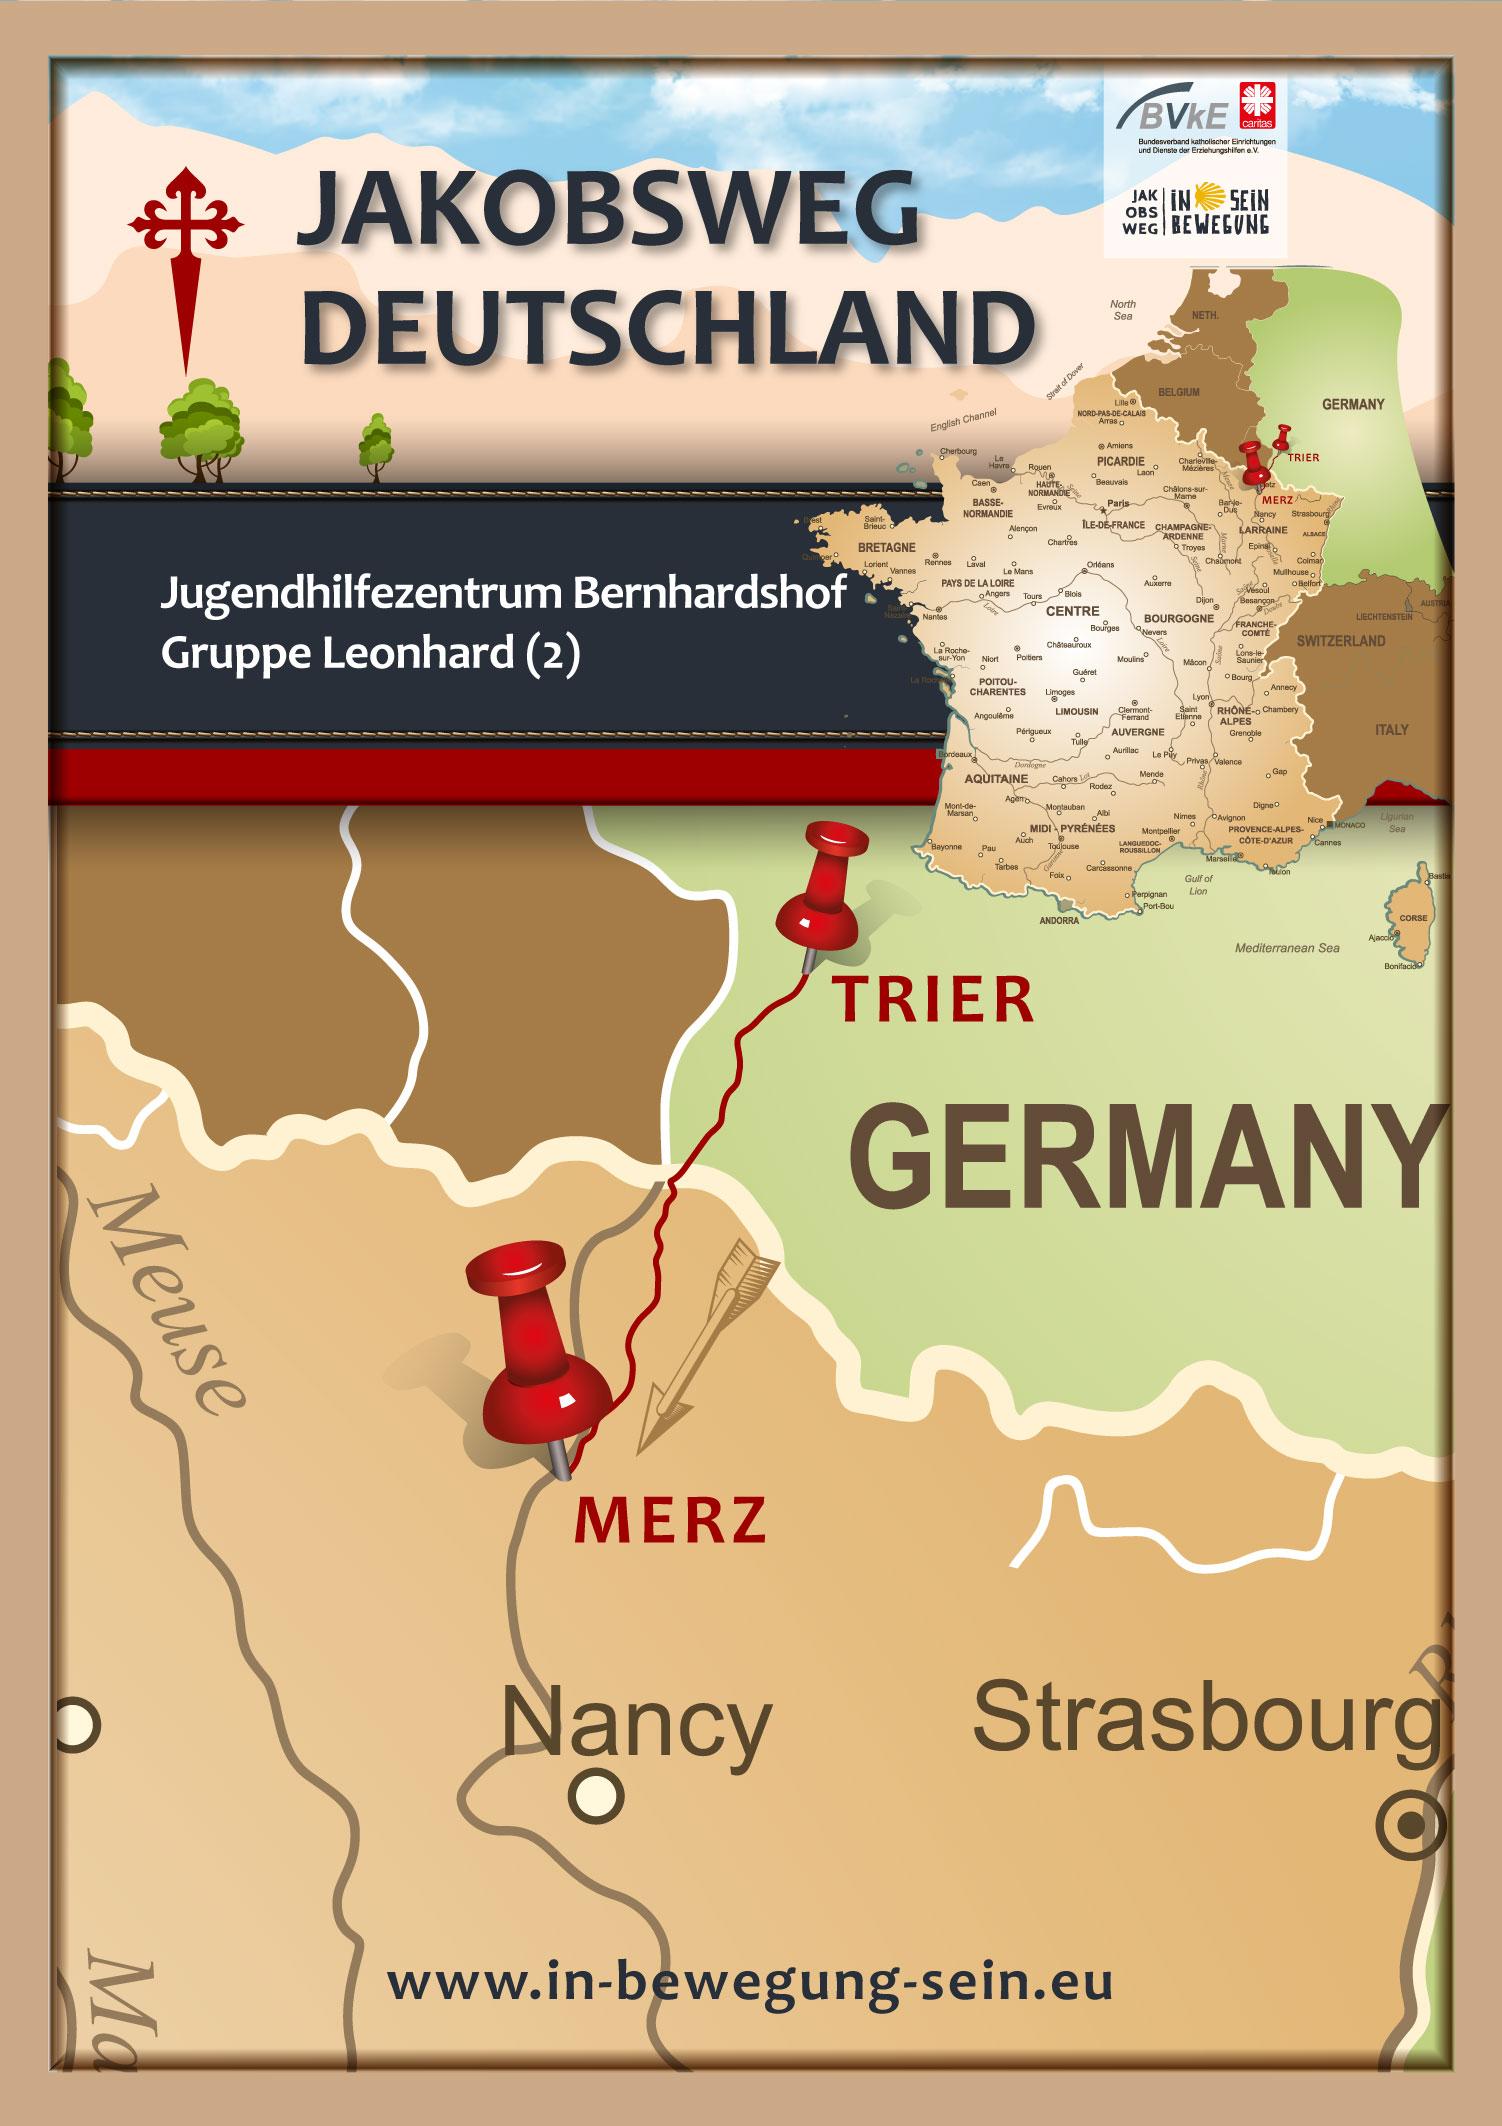 Posterkarte-JUGENDHILFEZENTRUM-BERNHARDSHOF-LEONHARD-(2)